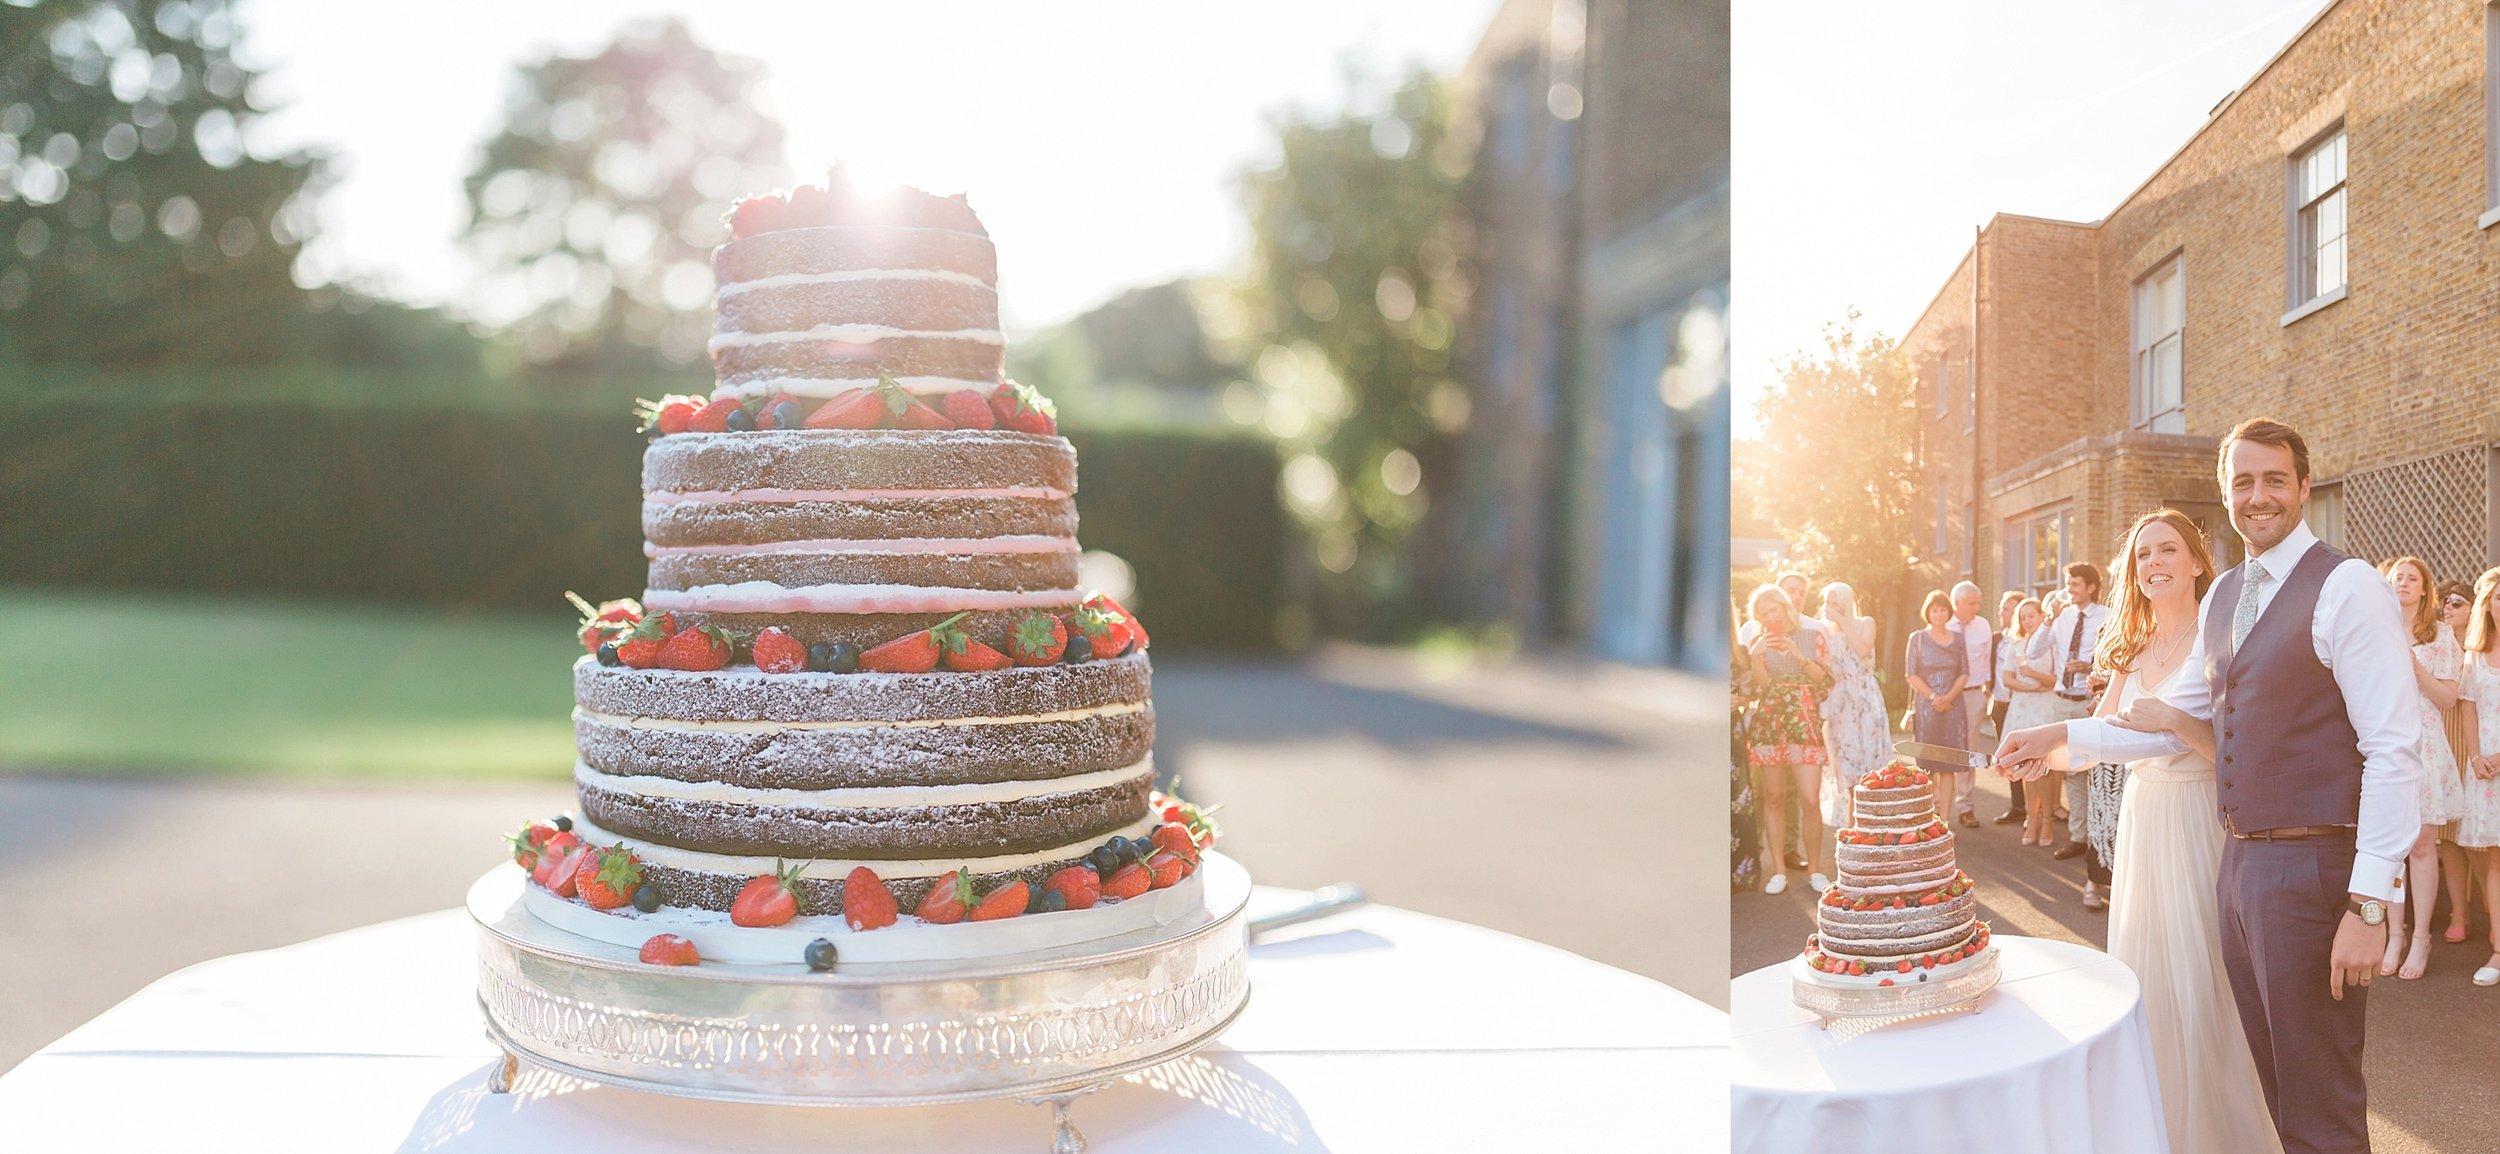 wedding cake kew gardens.jpg